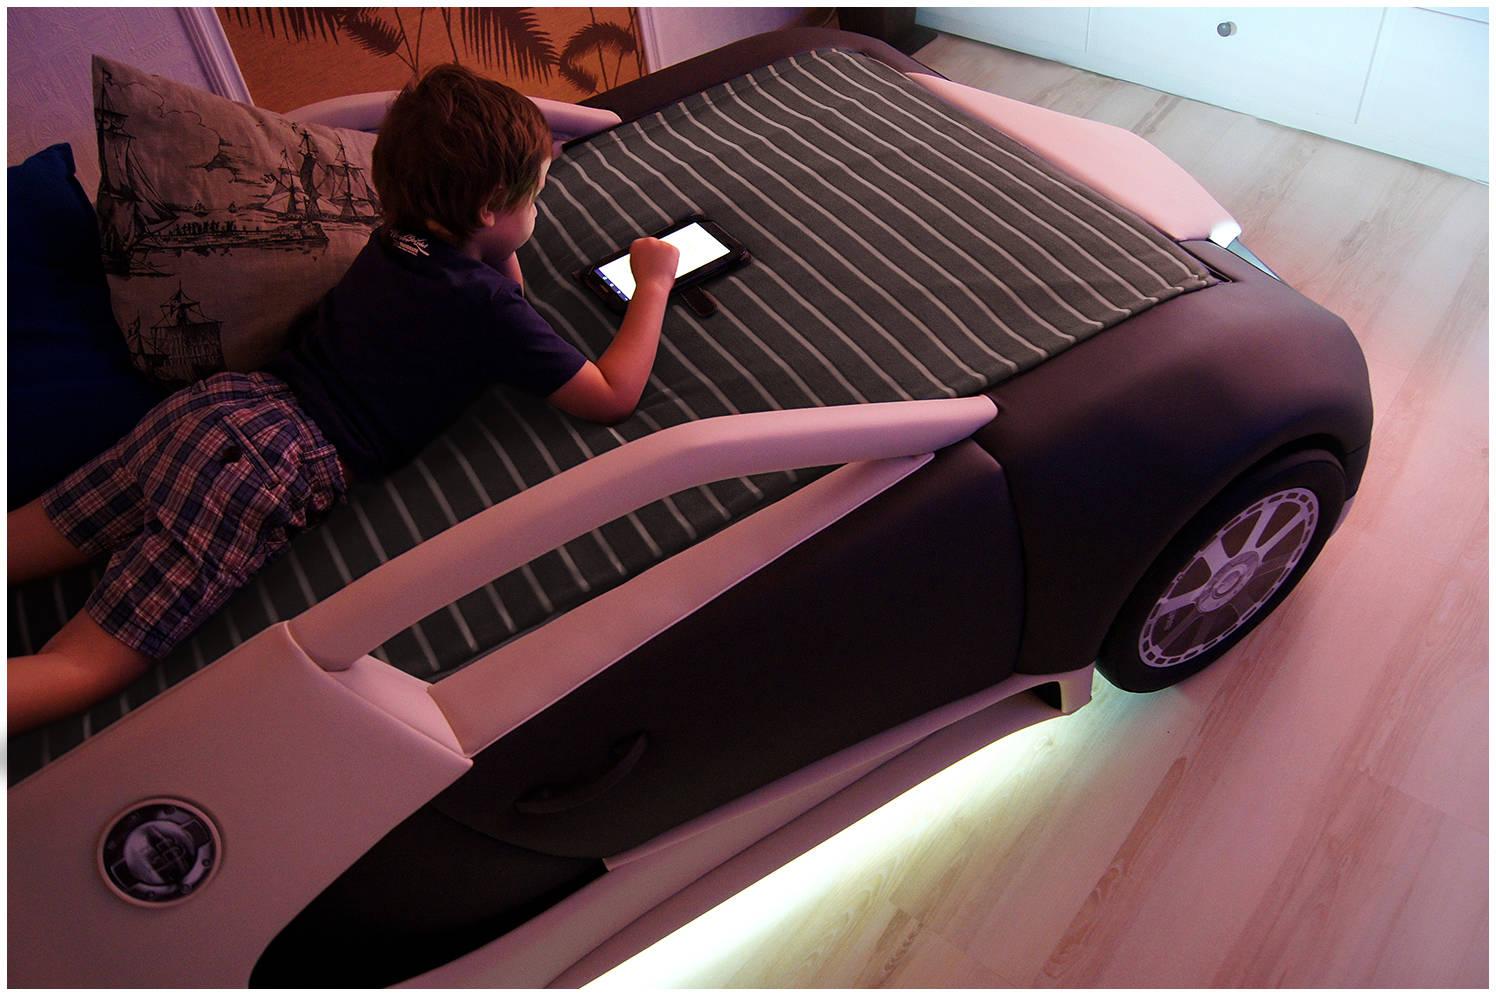 Кровать-автомобиль BugaTTi Veyron